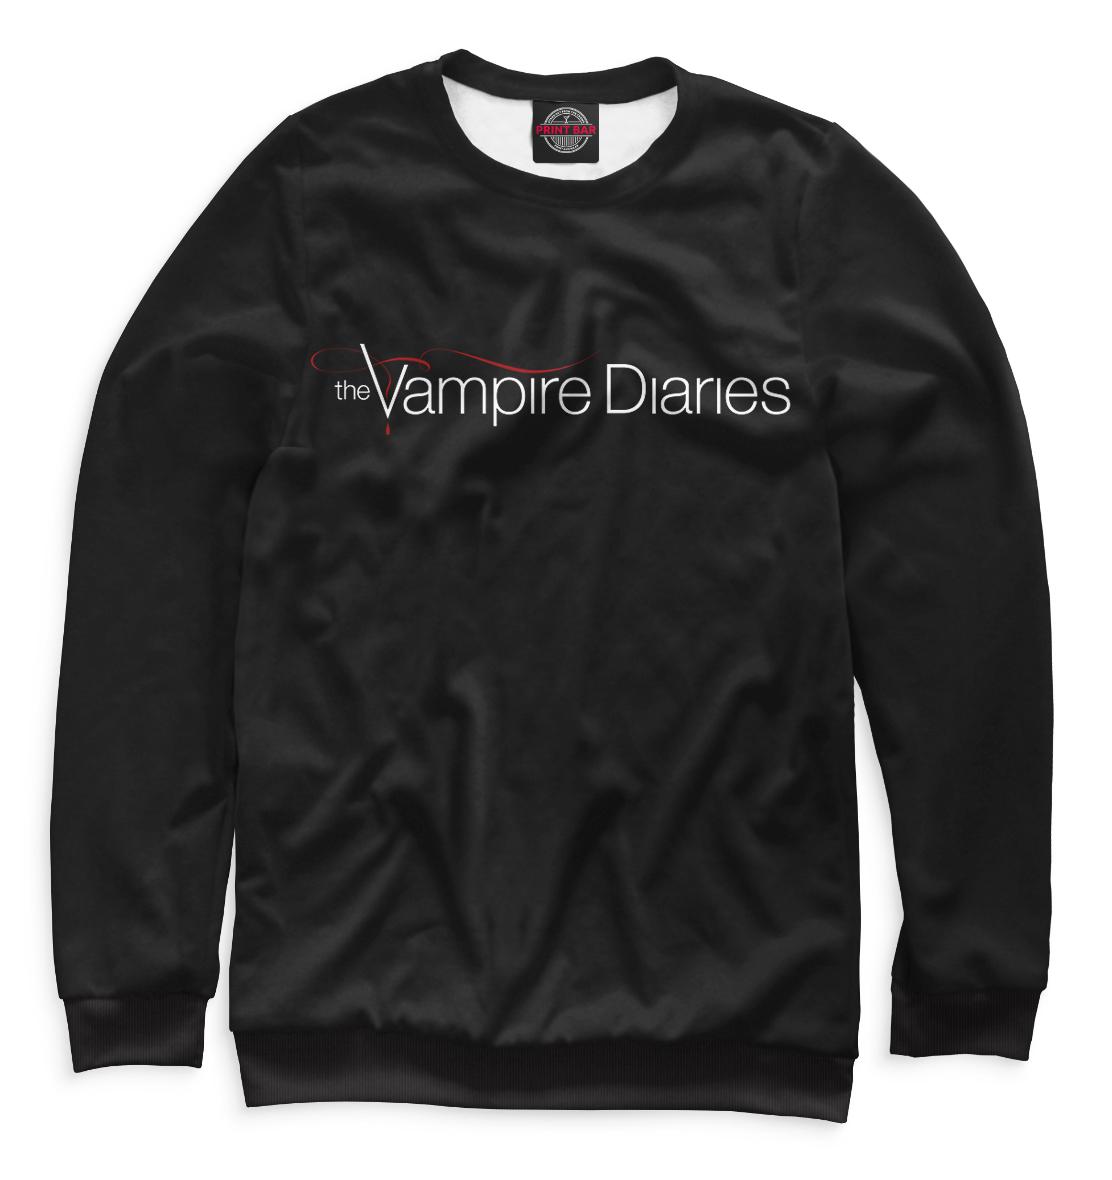 Купить Мужской свитшот Дневники вампира DNE-466176-swi-2